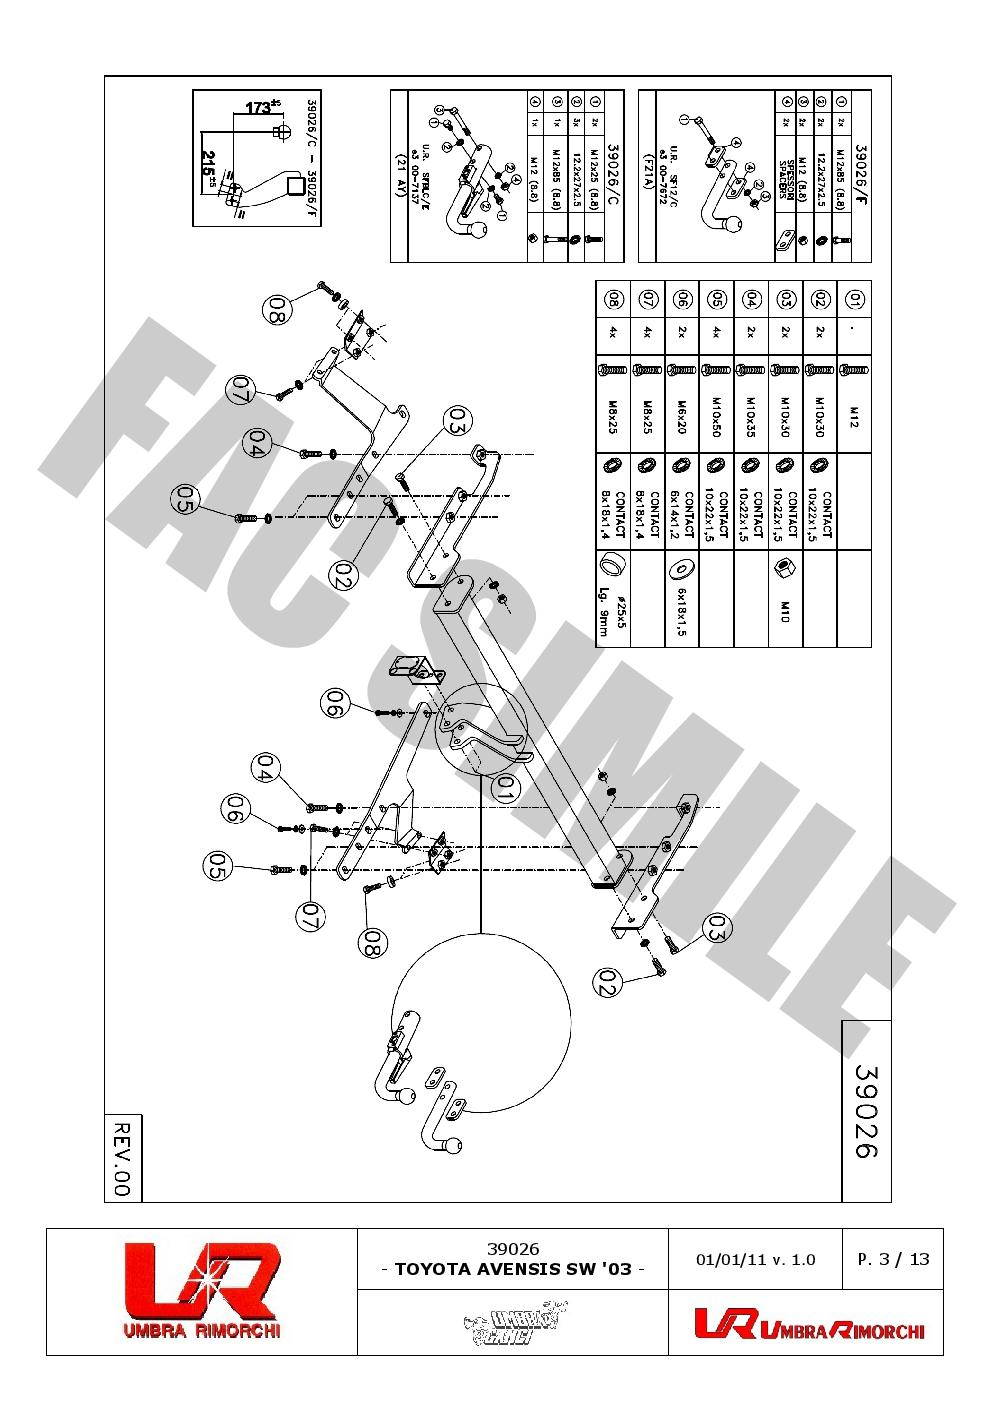 AHK Anhängerkupplung 7p E-Satz Toyota Avensis Station Wagon 03-08 39026/_A1